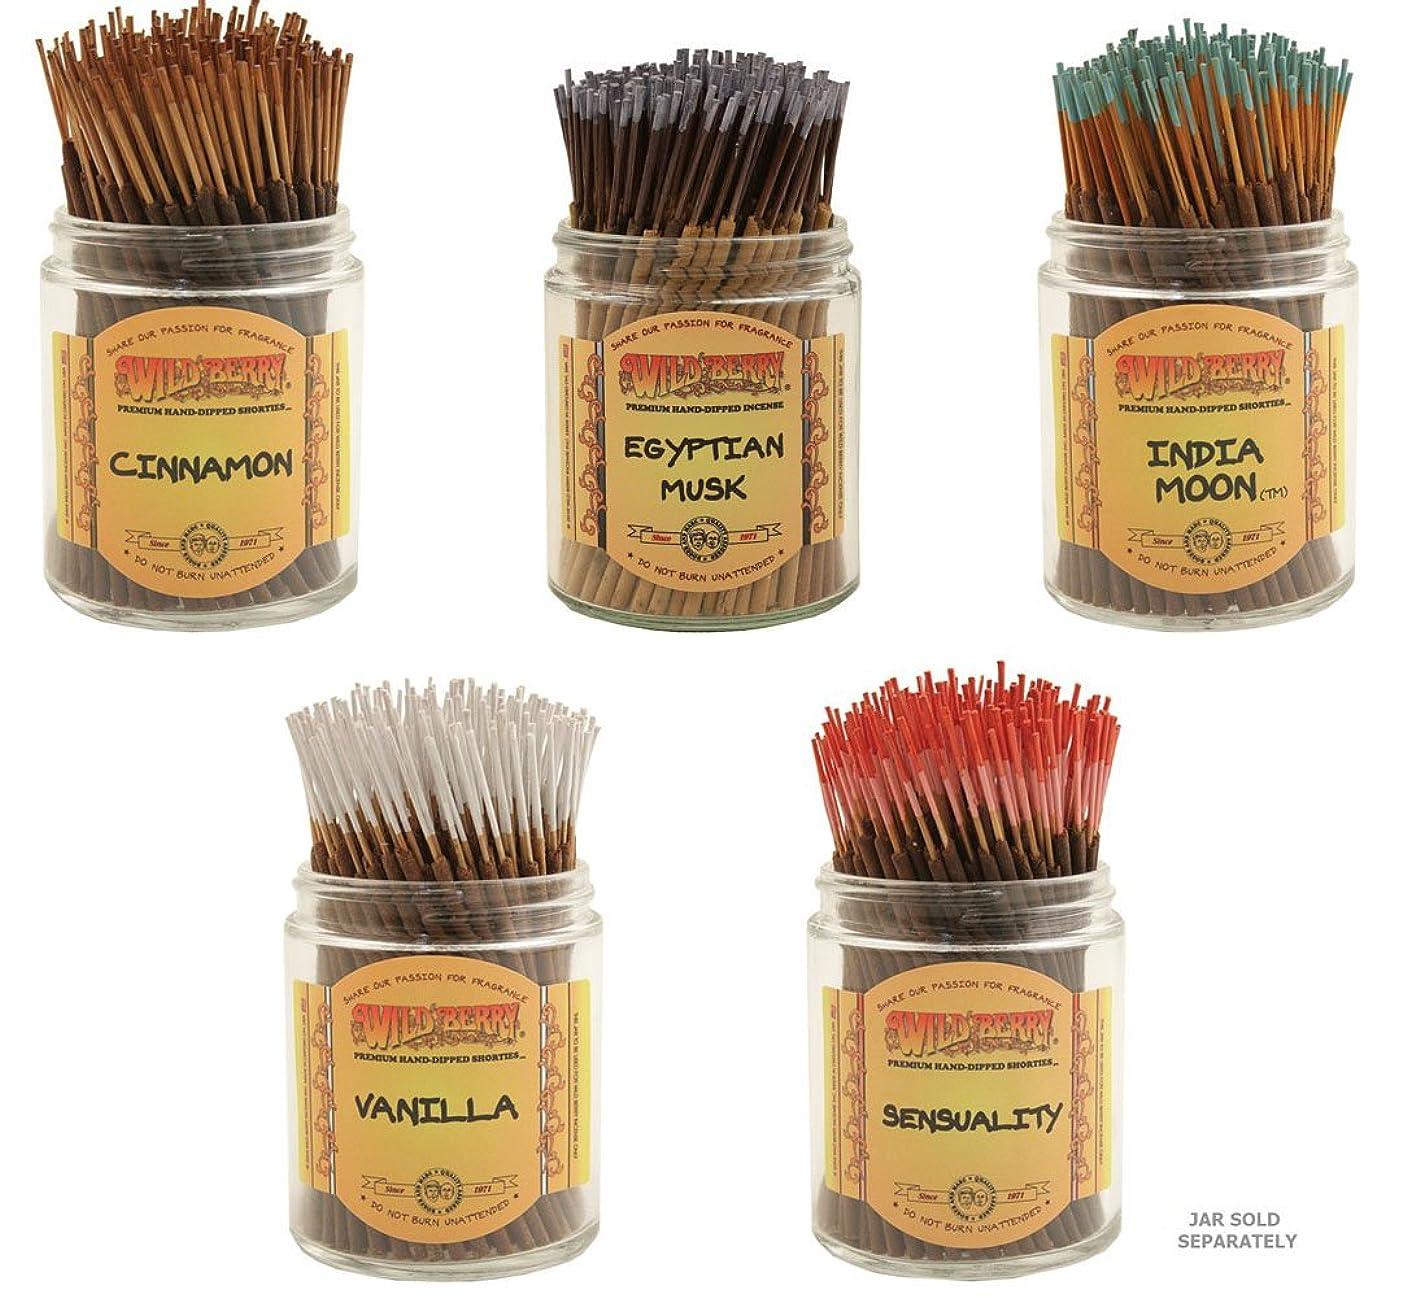 Wildberry Short Incense Sticks?–?Set of 5秋Fragrances?–?シナモン、エジプトムスク、インドMoon、Sensuality、バニラ(100各パック、合計500?Sticks)